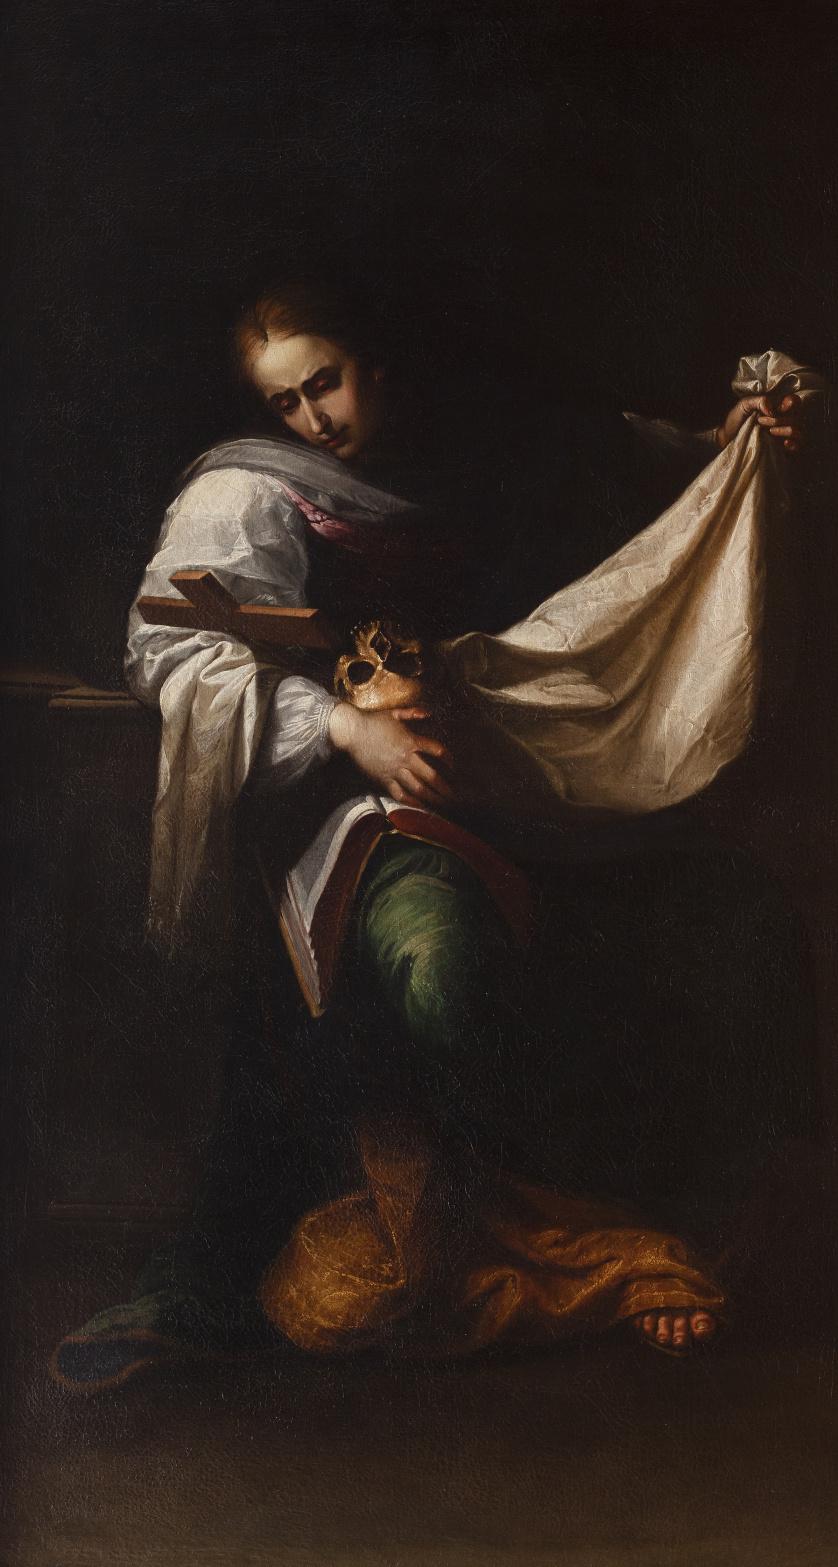 SEBASTIÁN LLANOS Y VALDÉS (circa 1605-1677) , SEBASTIÁN LLA